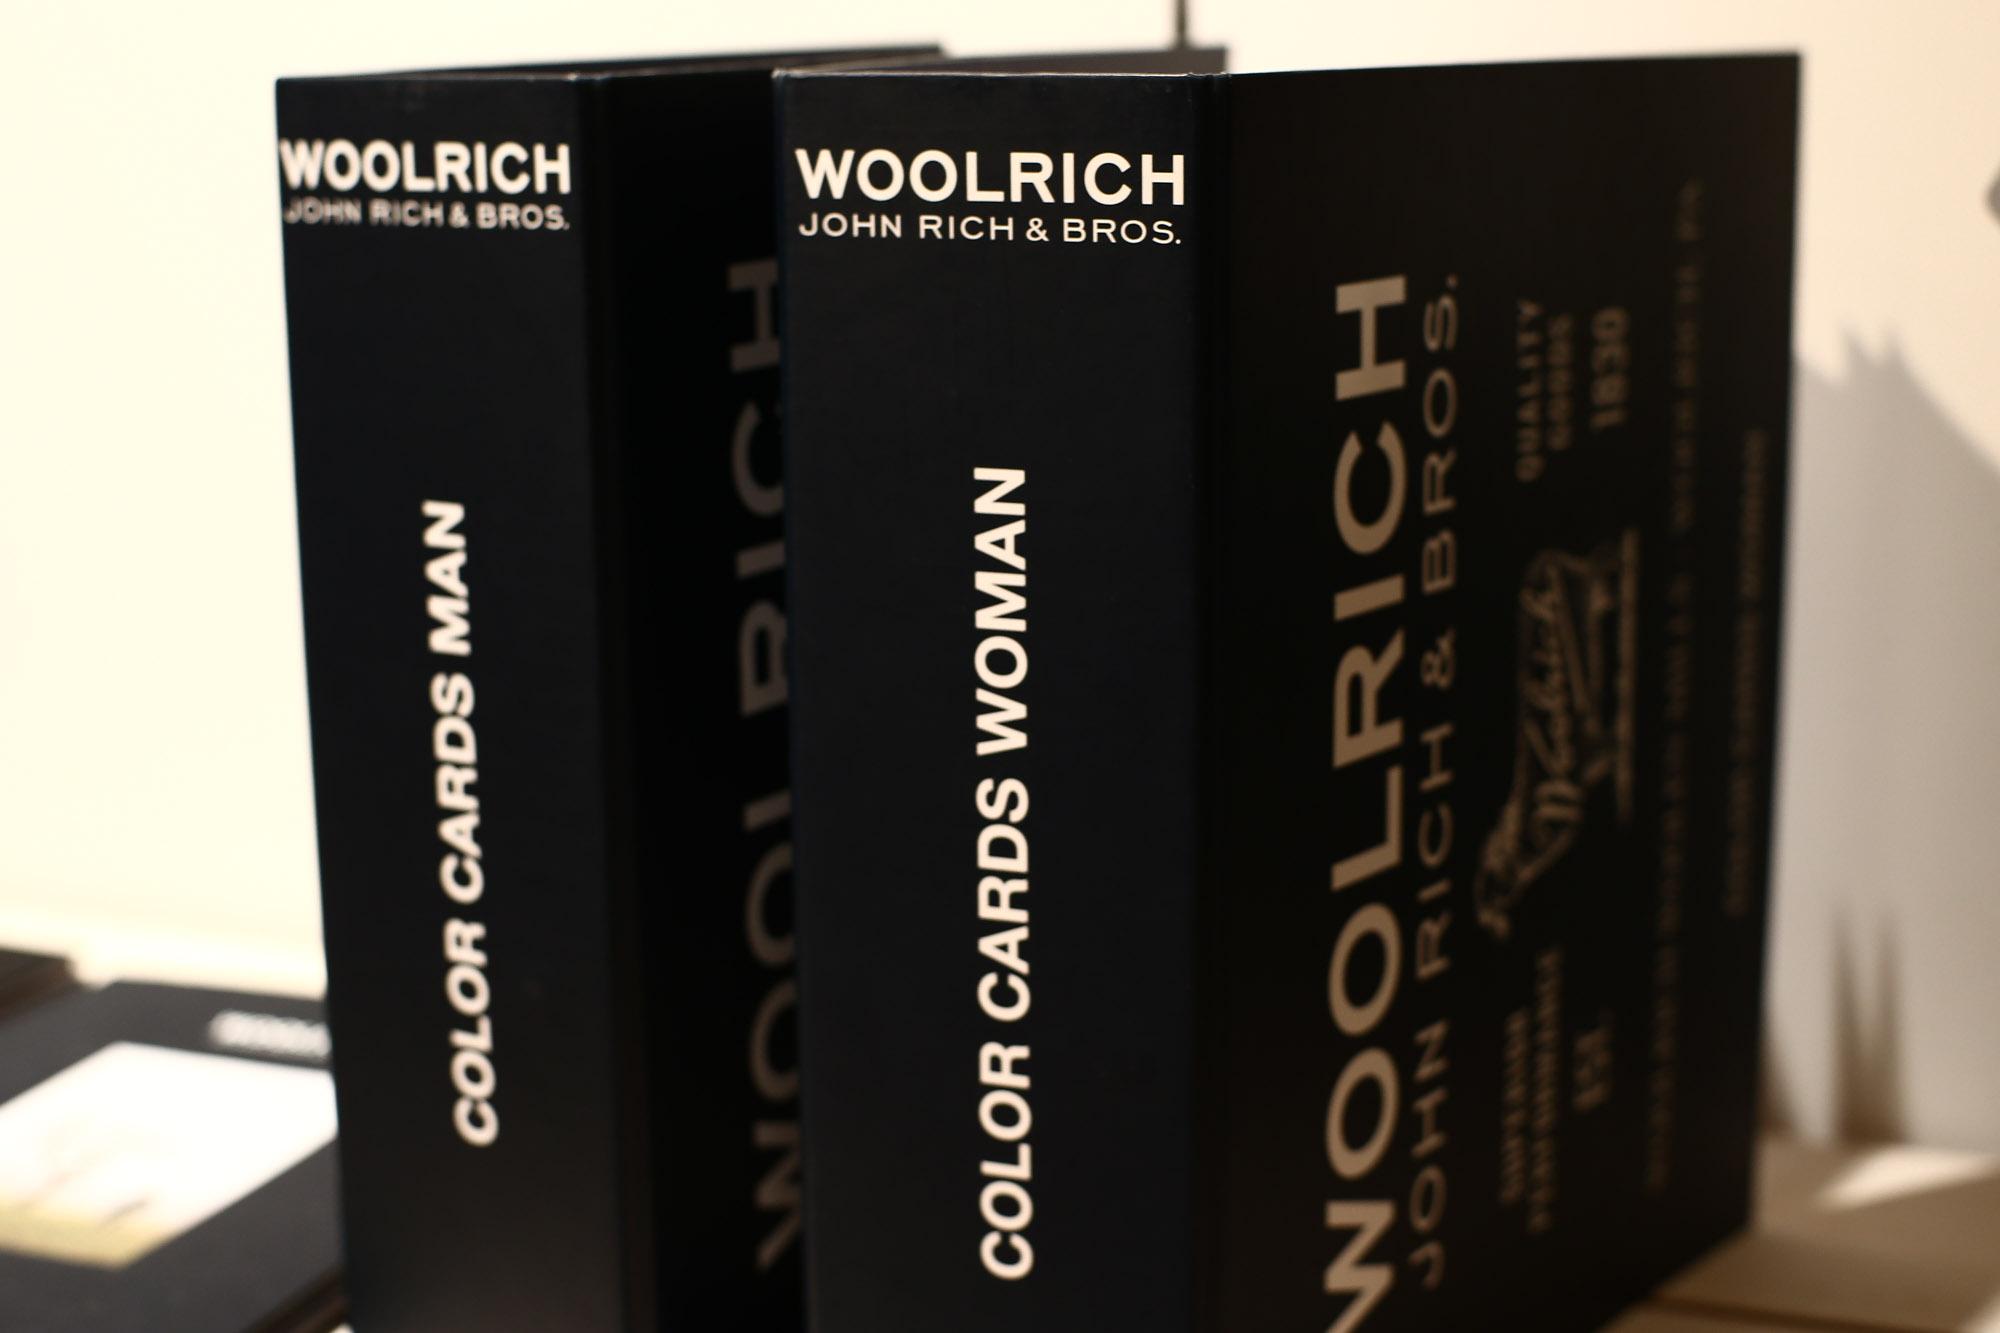 WOOLRICH / ウールリッチ (2017 秋冬展示会) 愛知 名古屋 ZODIAC ゾディアック woolrich ウールリッチ arctic parka アークティックパーカ 60/40 BLIZZARD PARKA ブリザードパーカ ダウンジャケット ダウンパーカ